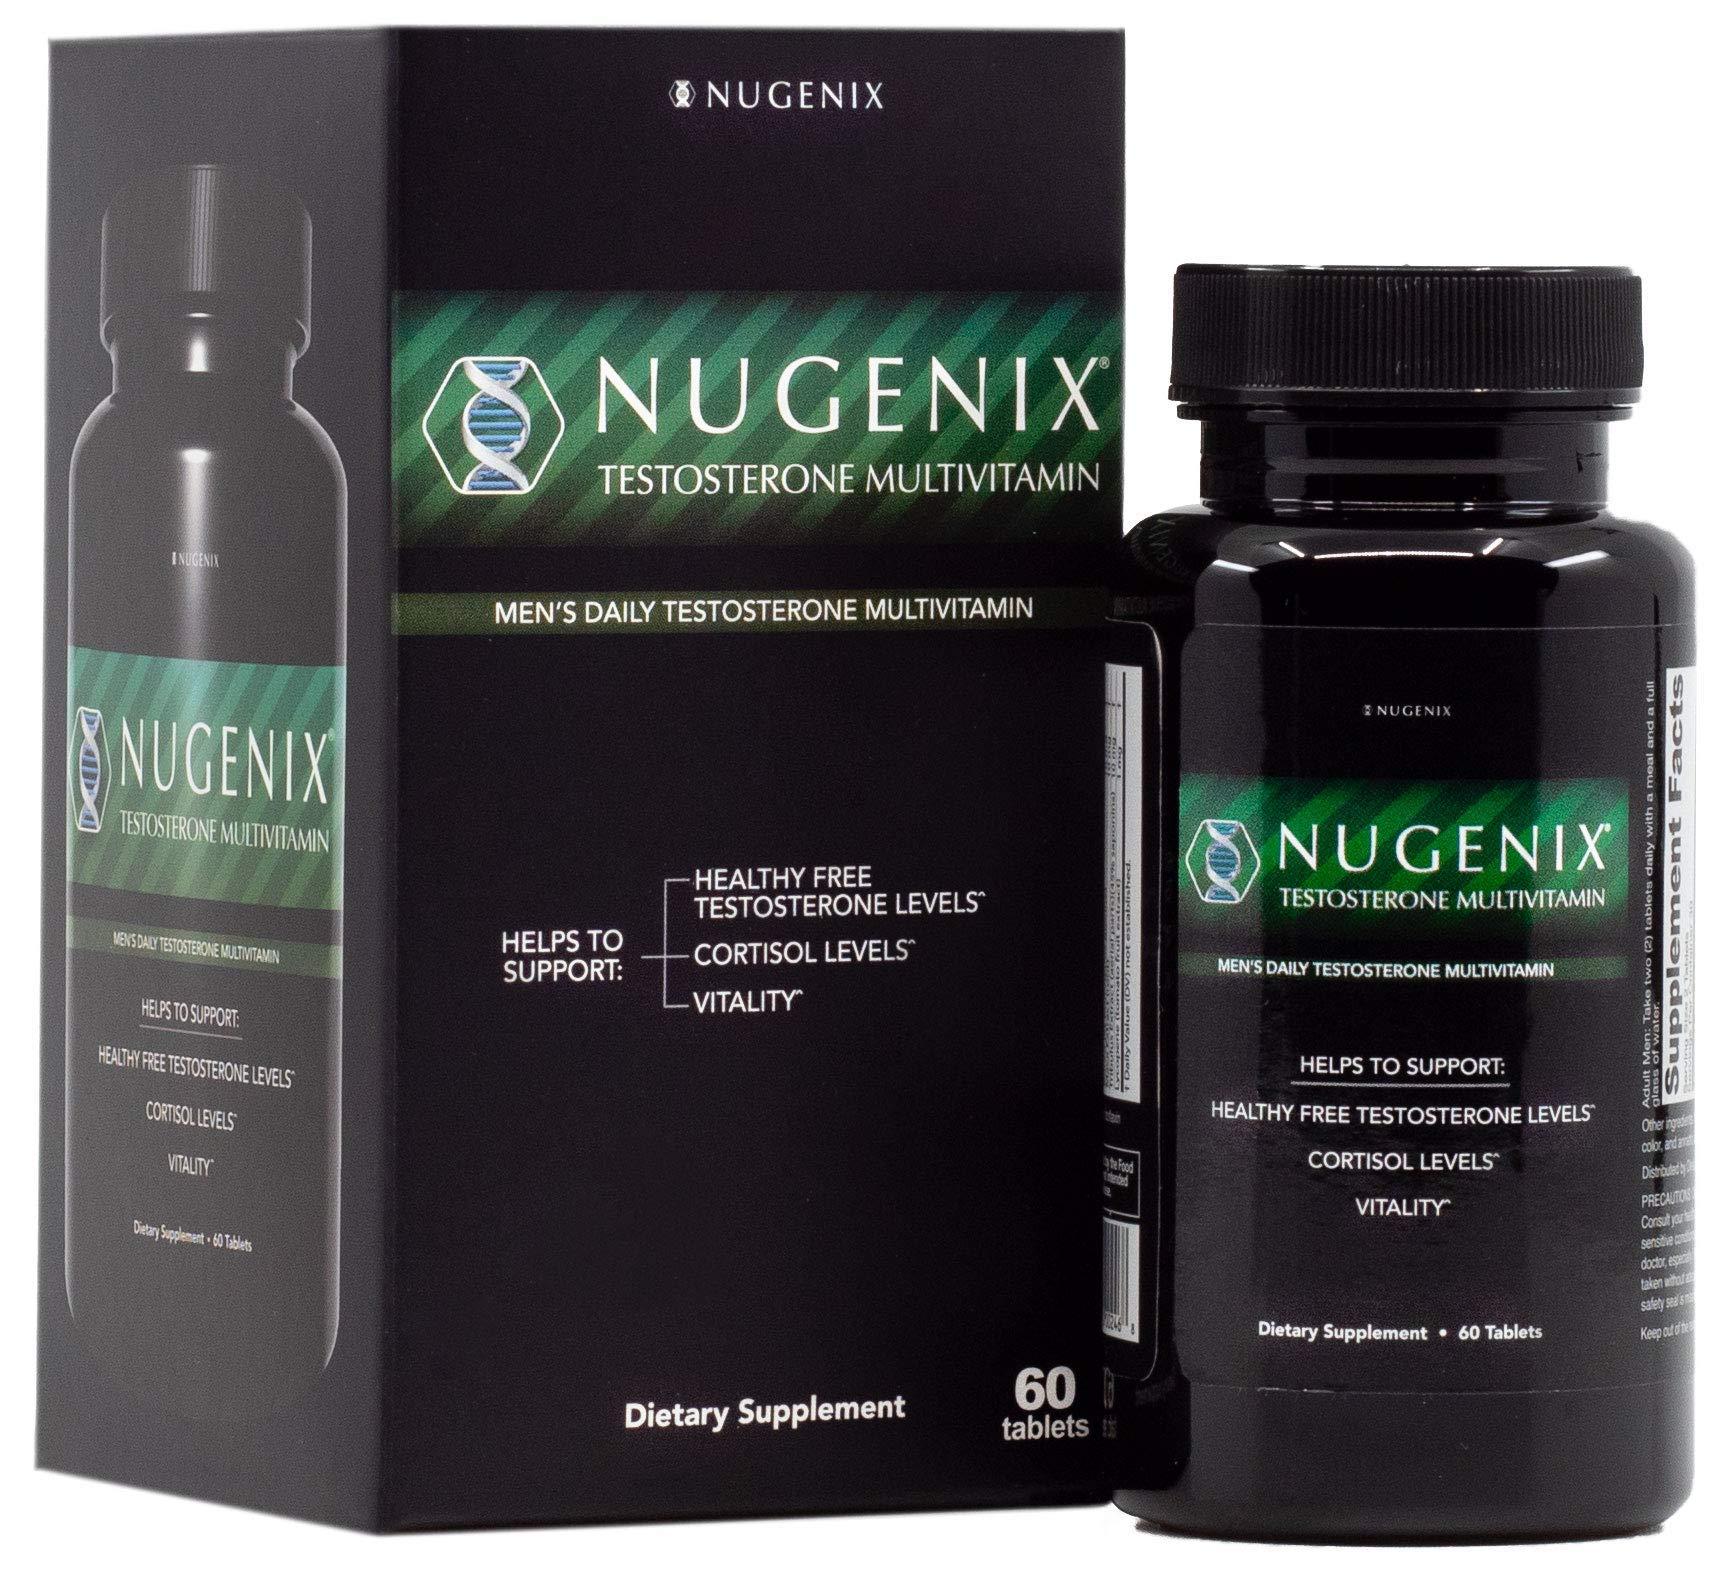 Nugenix Men's Daily Testosterone Multivitamin - 19 Vitamins and Minerals, Supports Free Testosterone